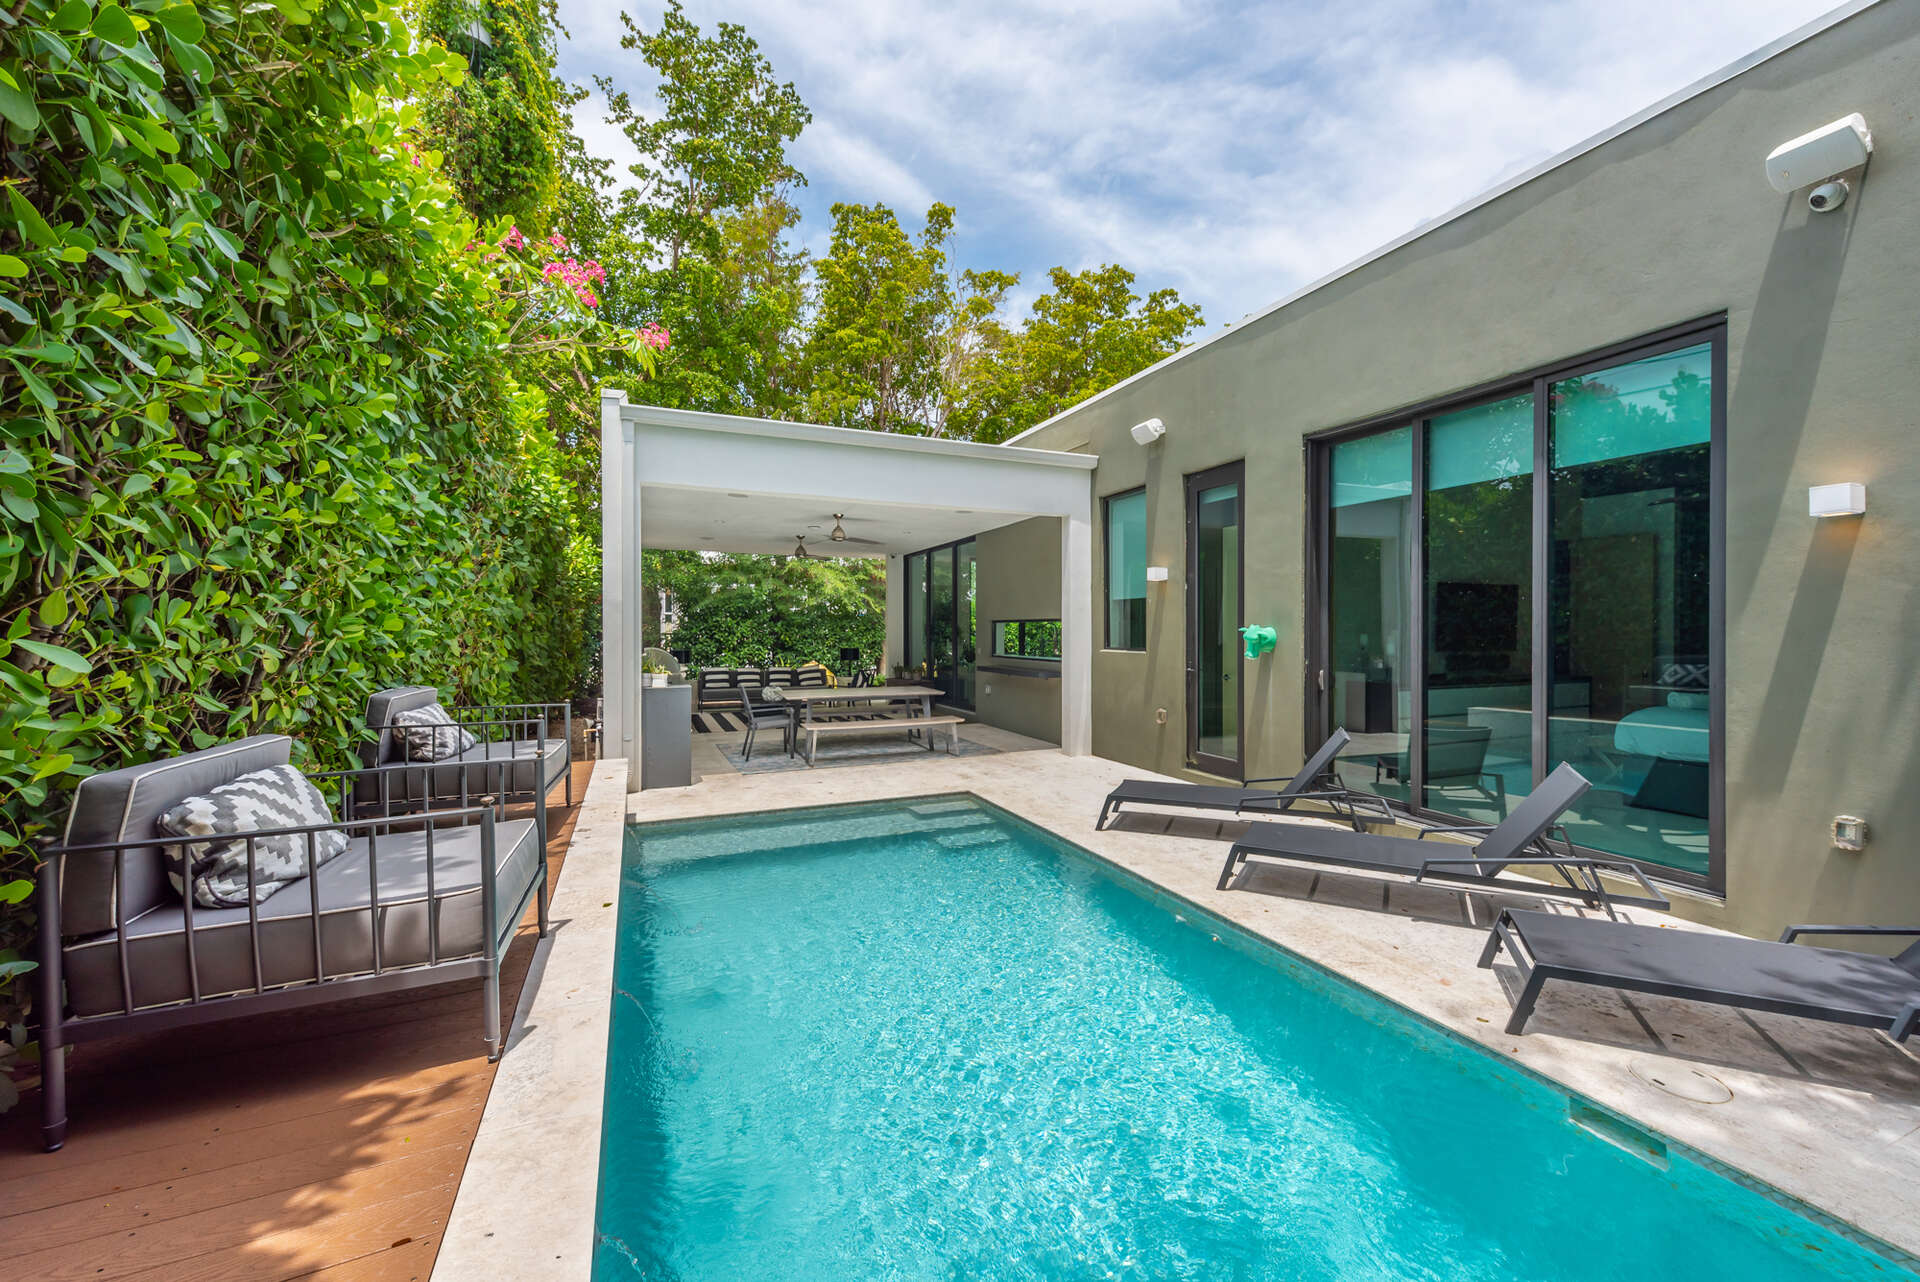 Luxury vacation rentals usa - Florida - Miami - Design district - Villa Amaya - Image 1/42